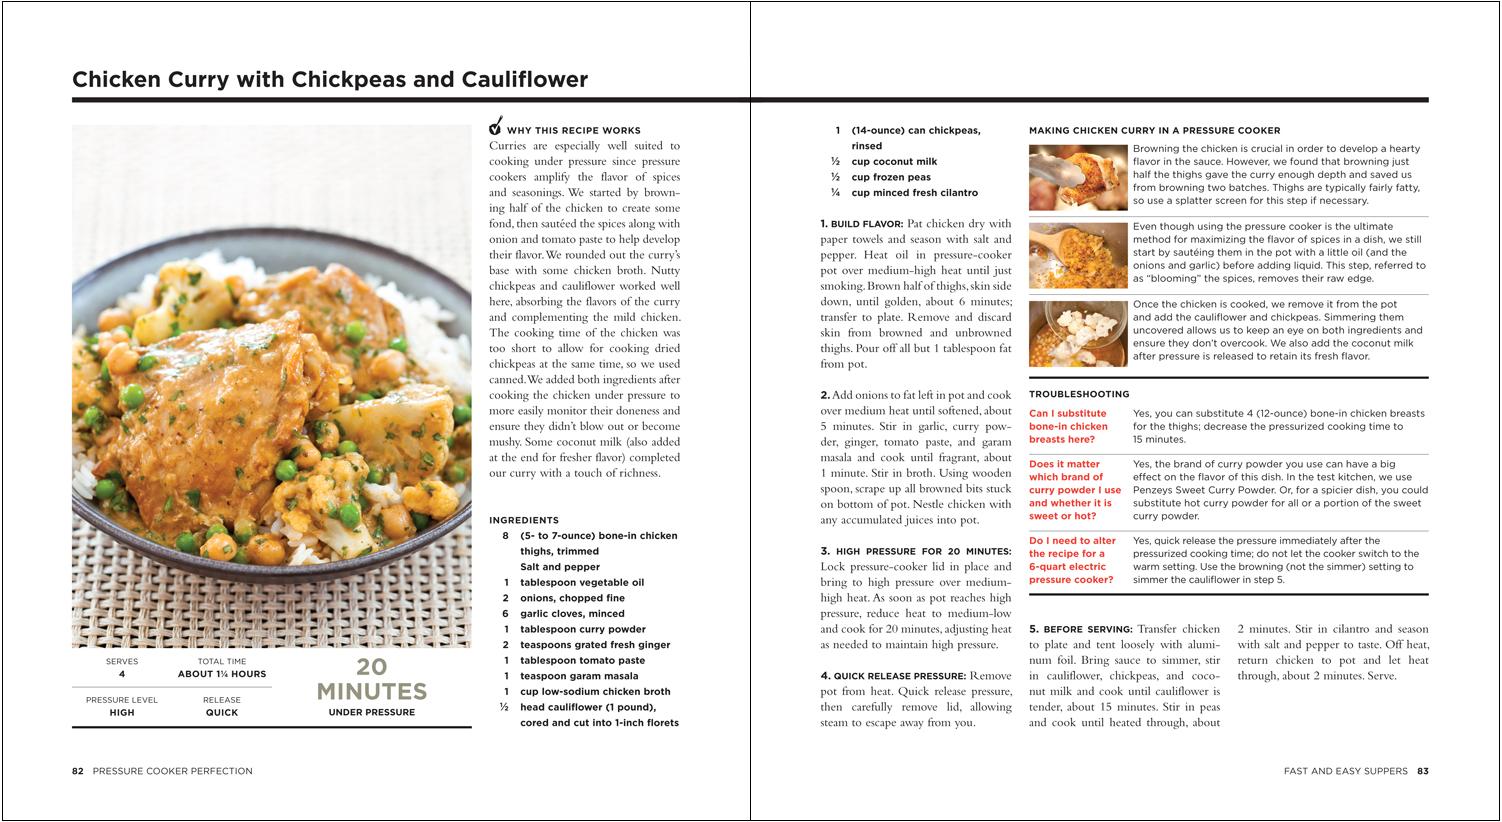 PC_CH3_recipe.jpg